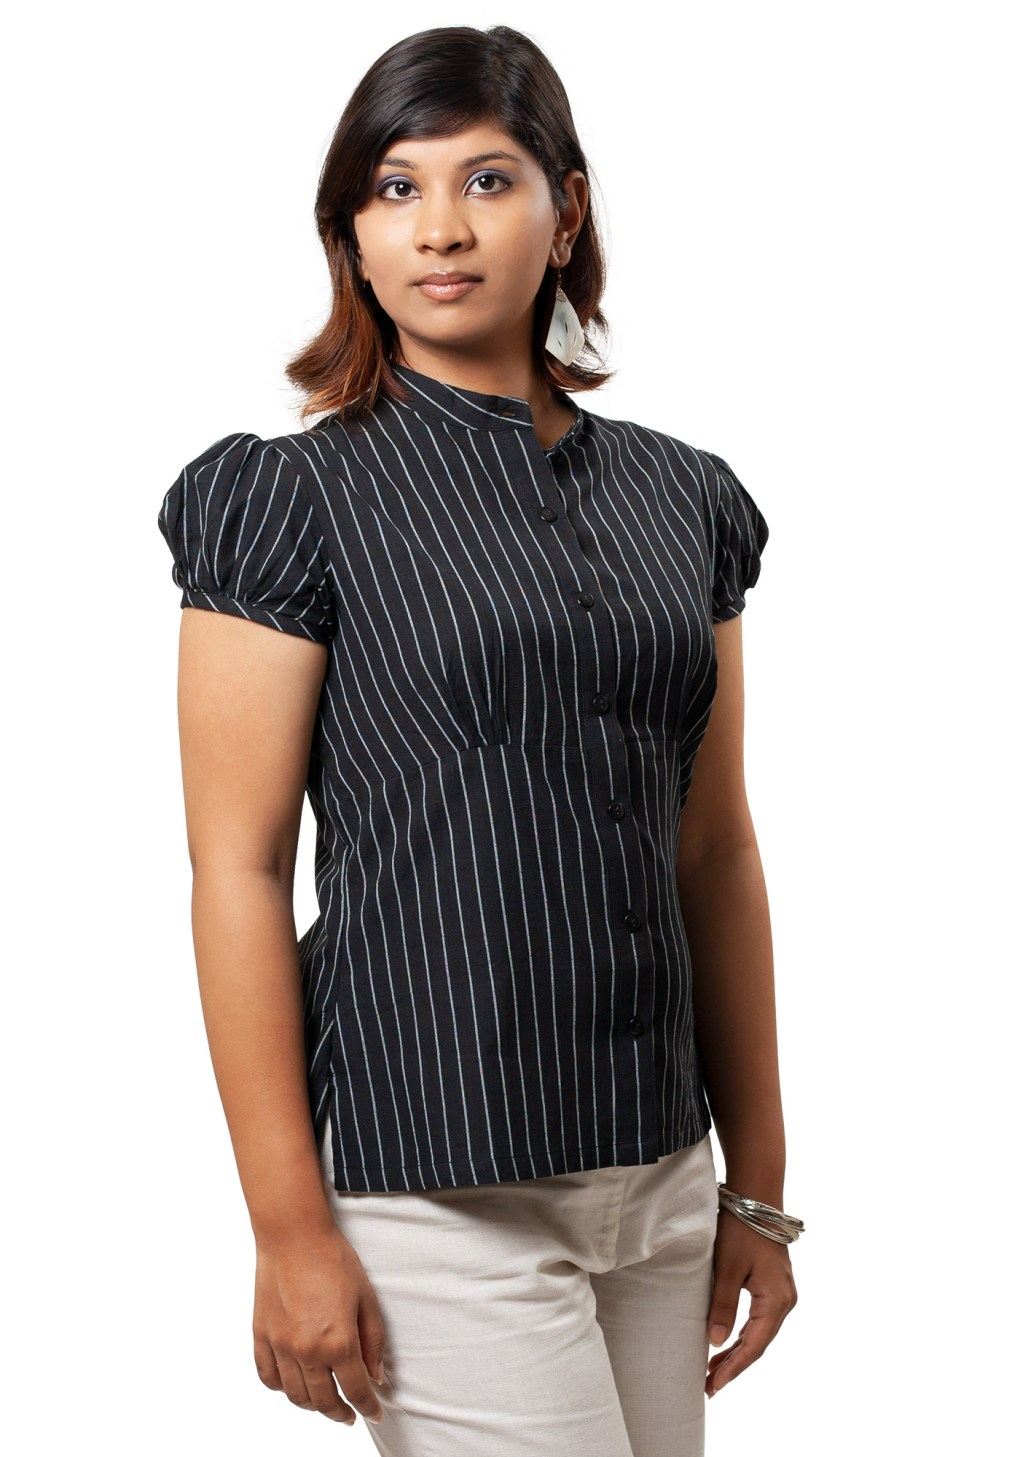 MINC ecofashion Puff Sleeve Shirt In Pinstripe Black Cotton